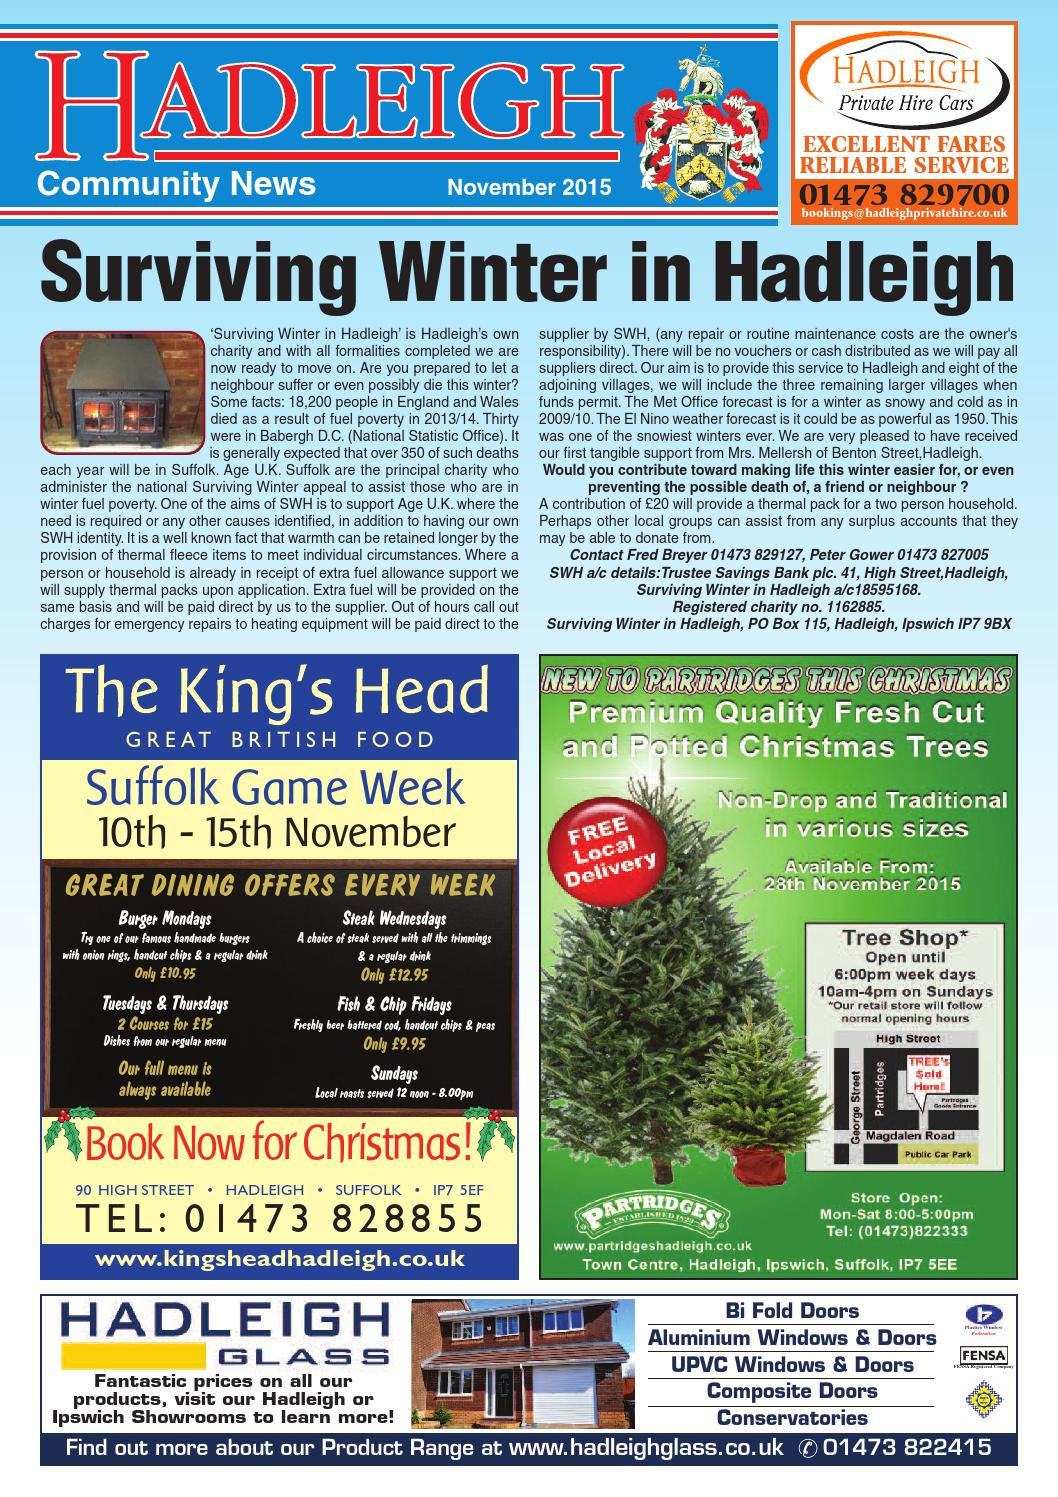 Hadleigh Community News, November 2015 by Keith Avis Printers - issuu